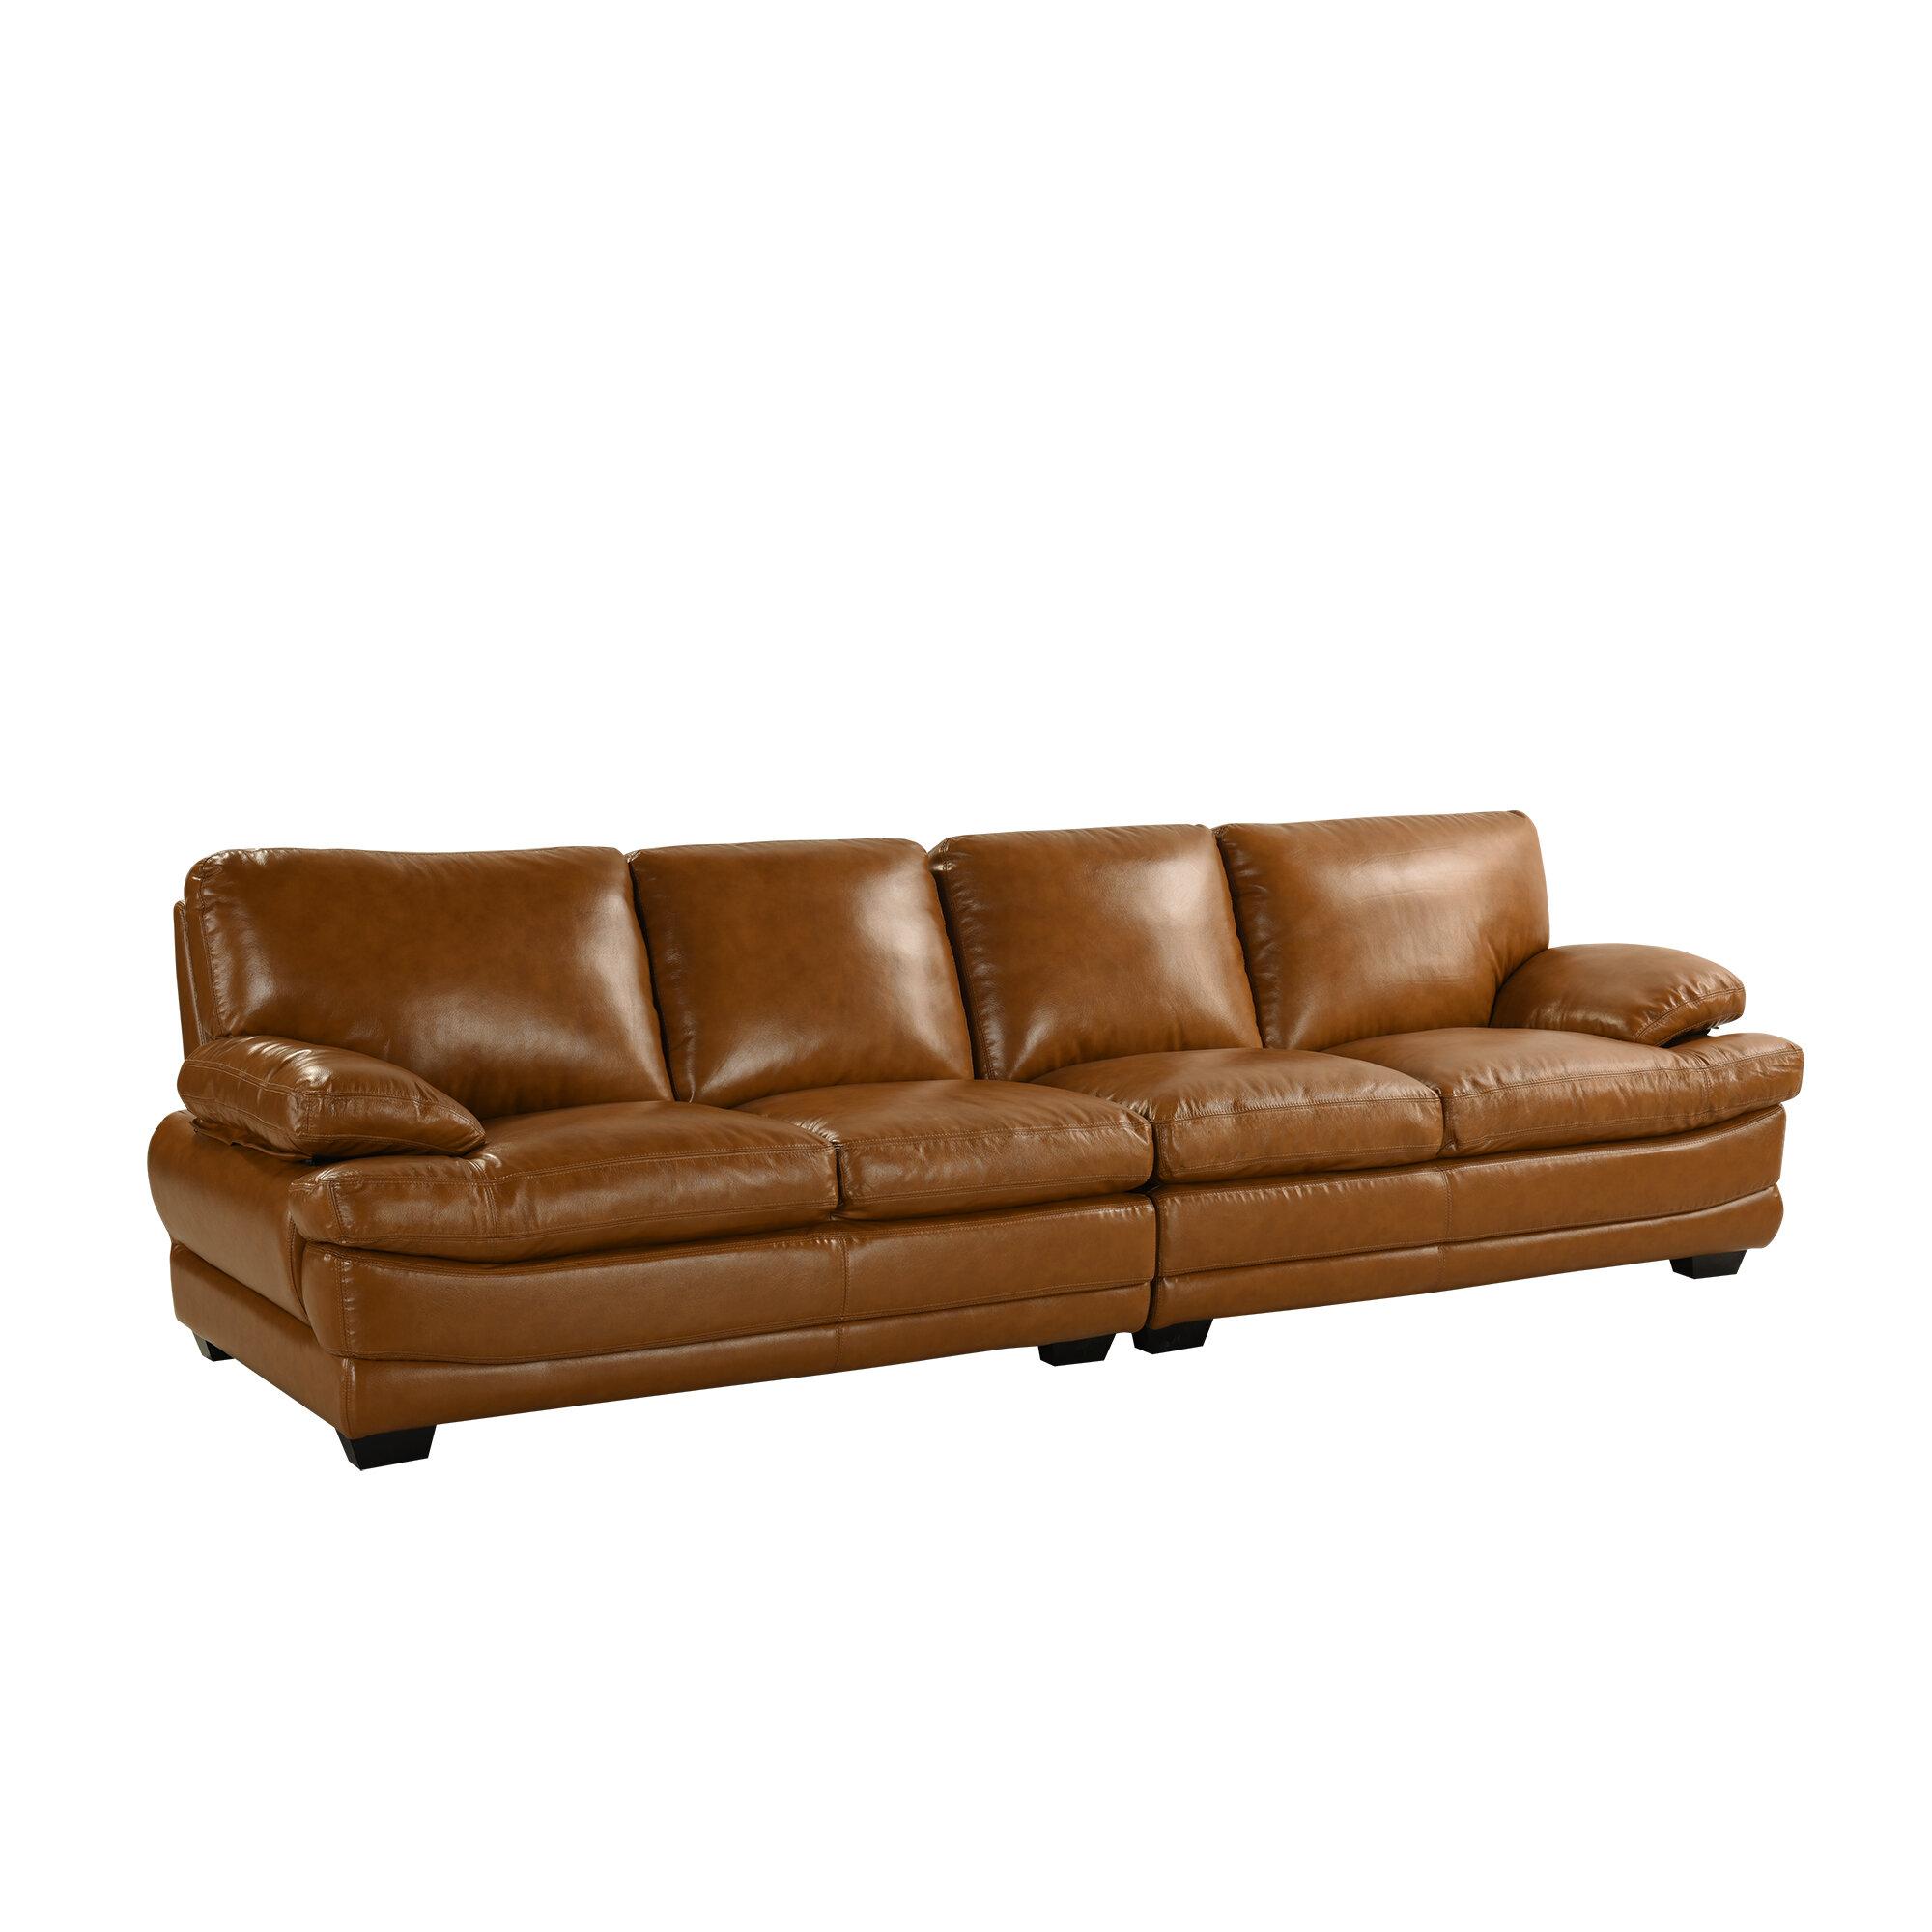 Laude Run Gueye Overstuffed Leather